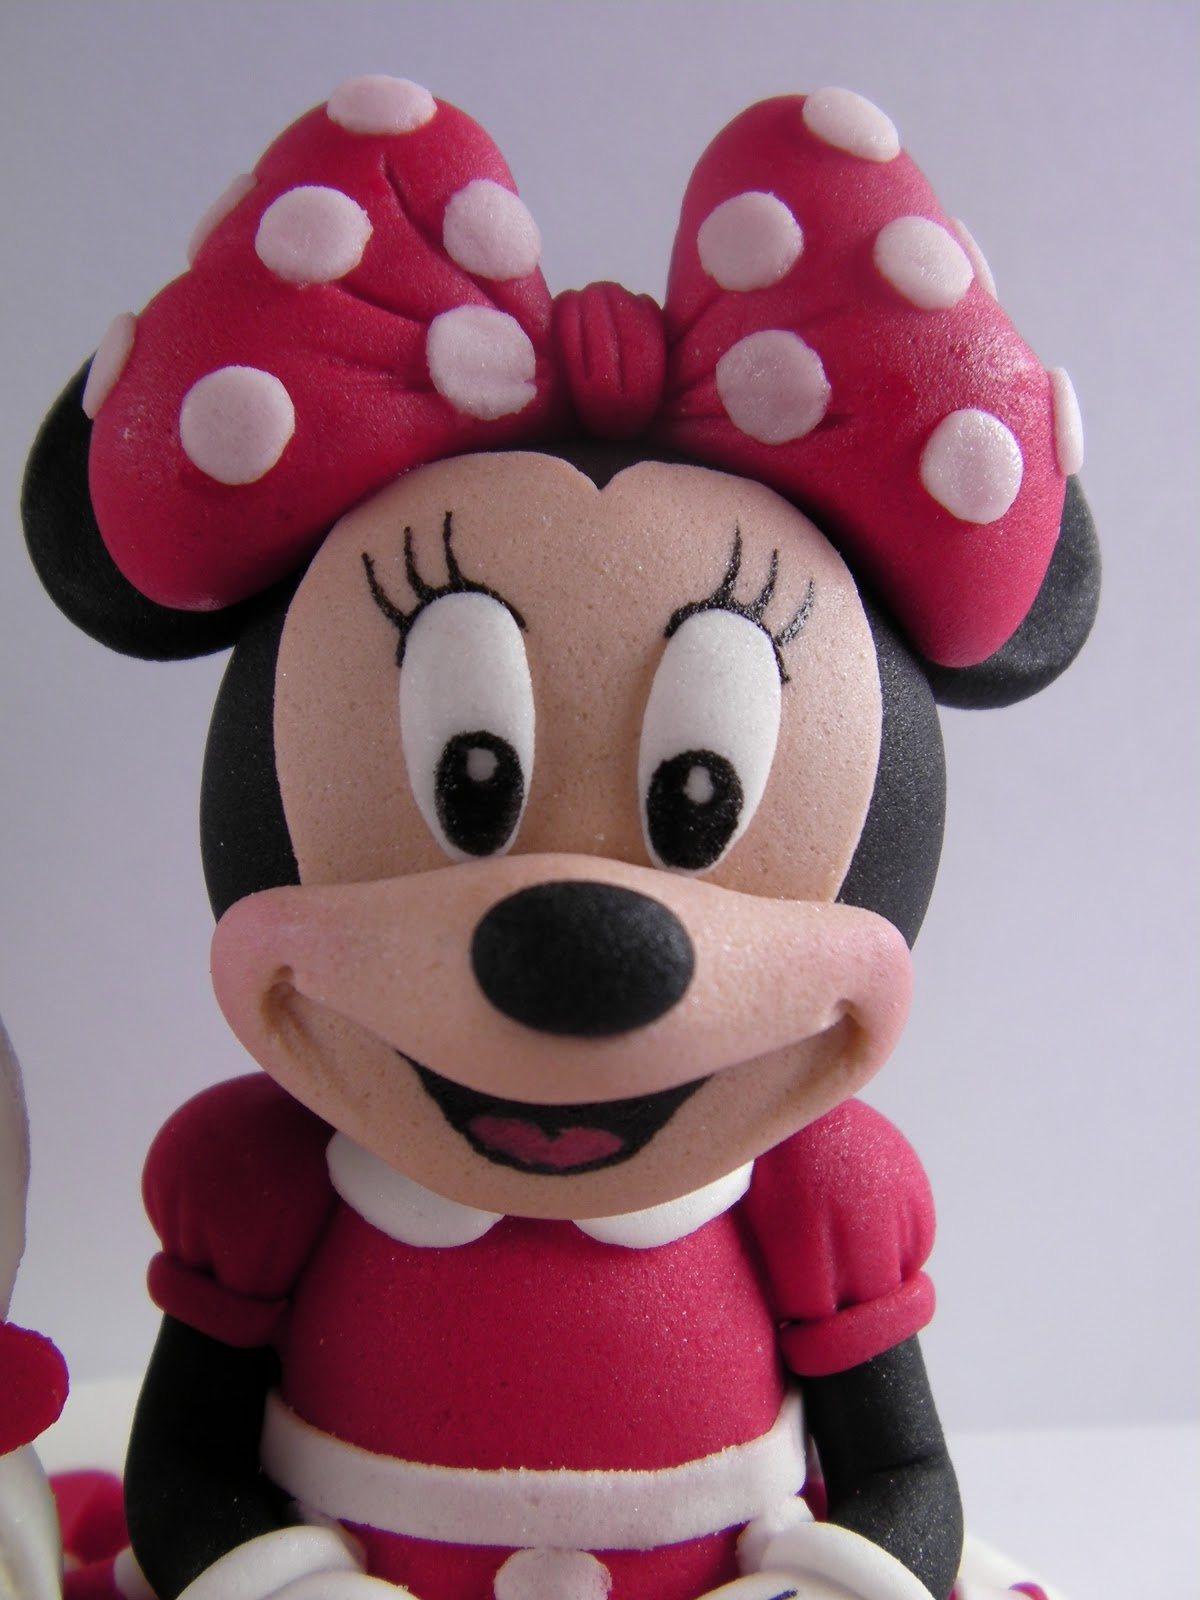 mini maus minnie mouse sedeca figura od fondana sitting fondant figure. Black Bedroom Furniture Sets. Home Design Ideas